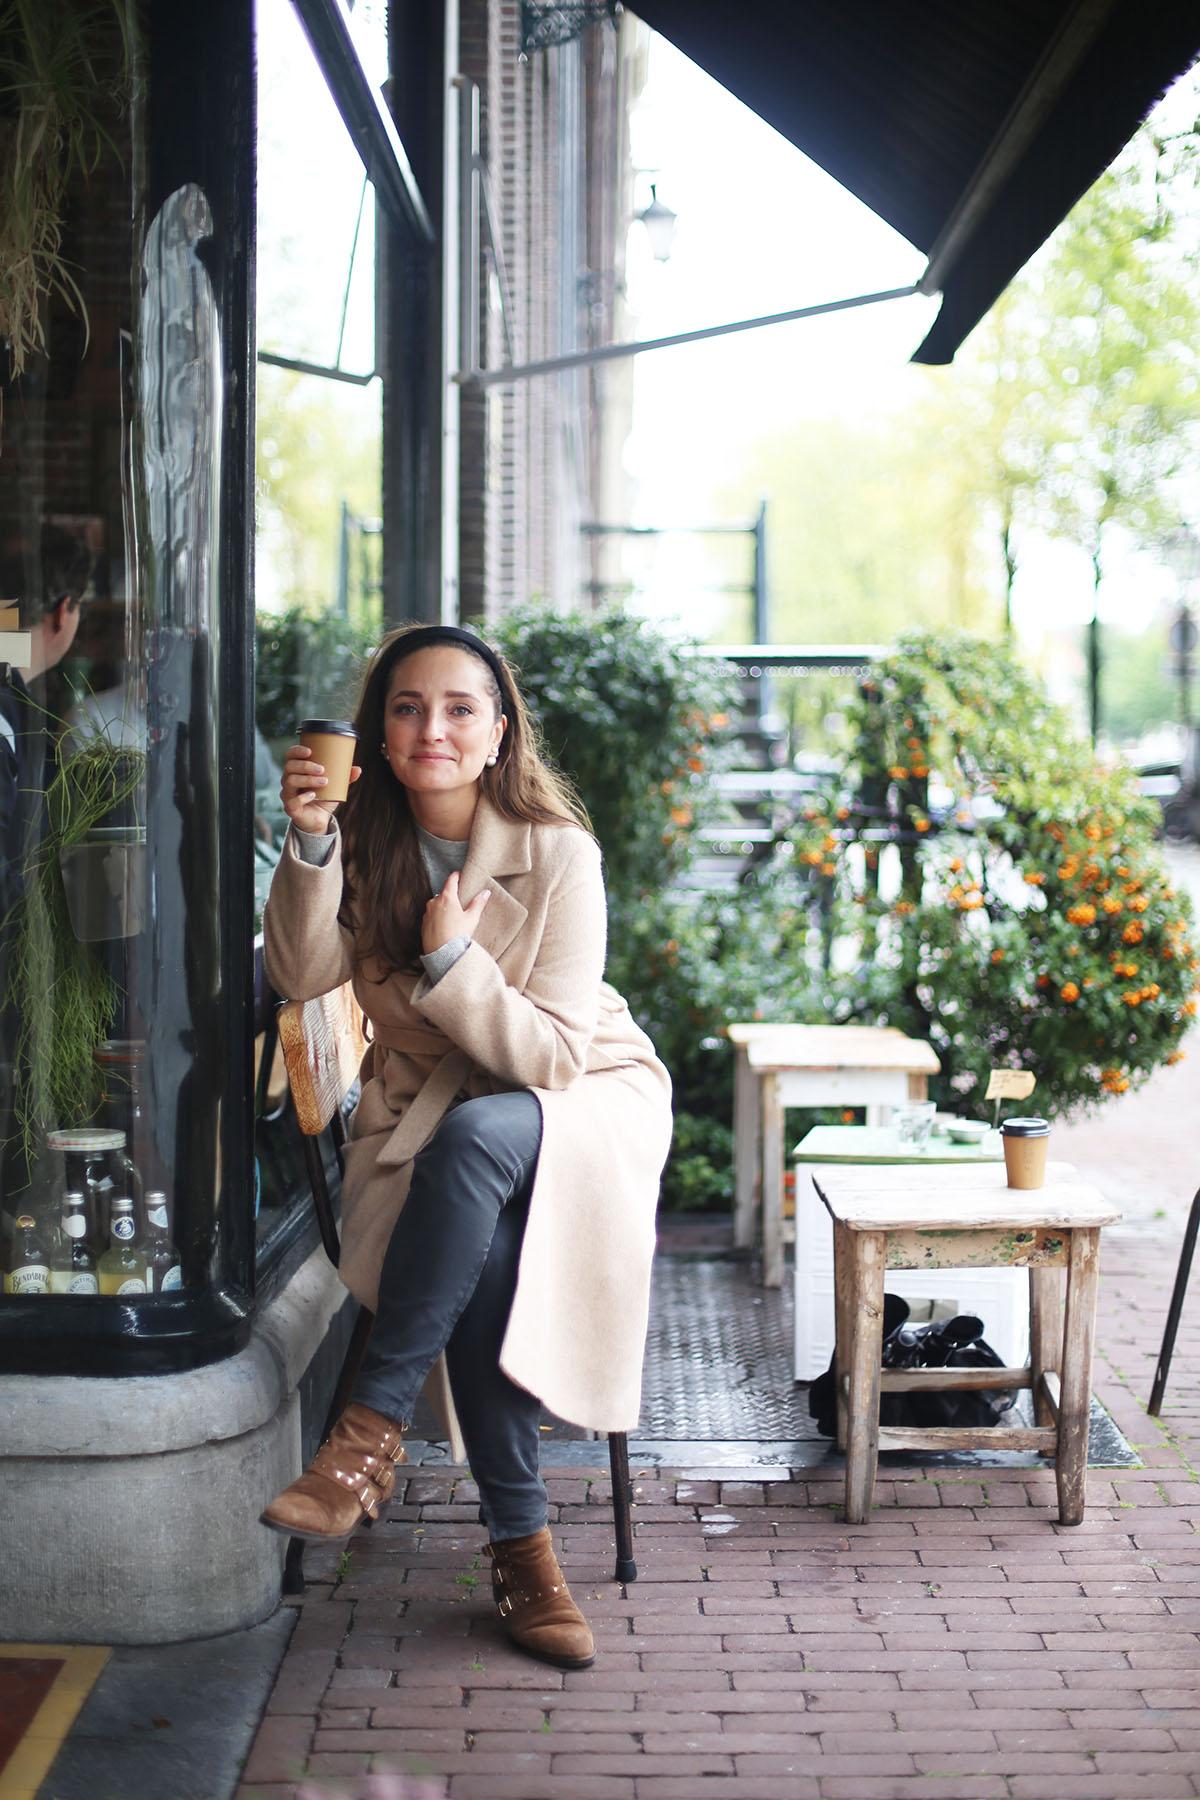 Avec Sofié Blog l 6 things living abroad has taught me